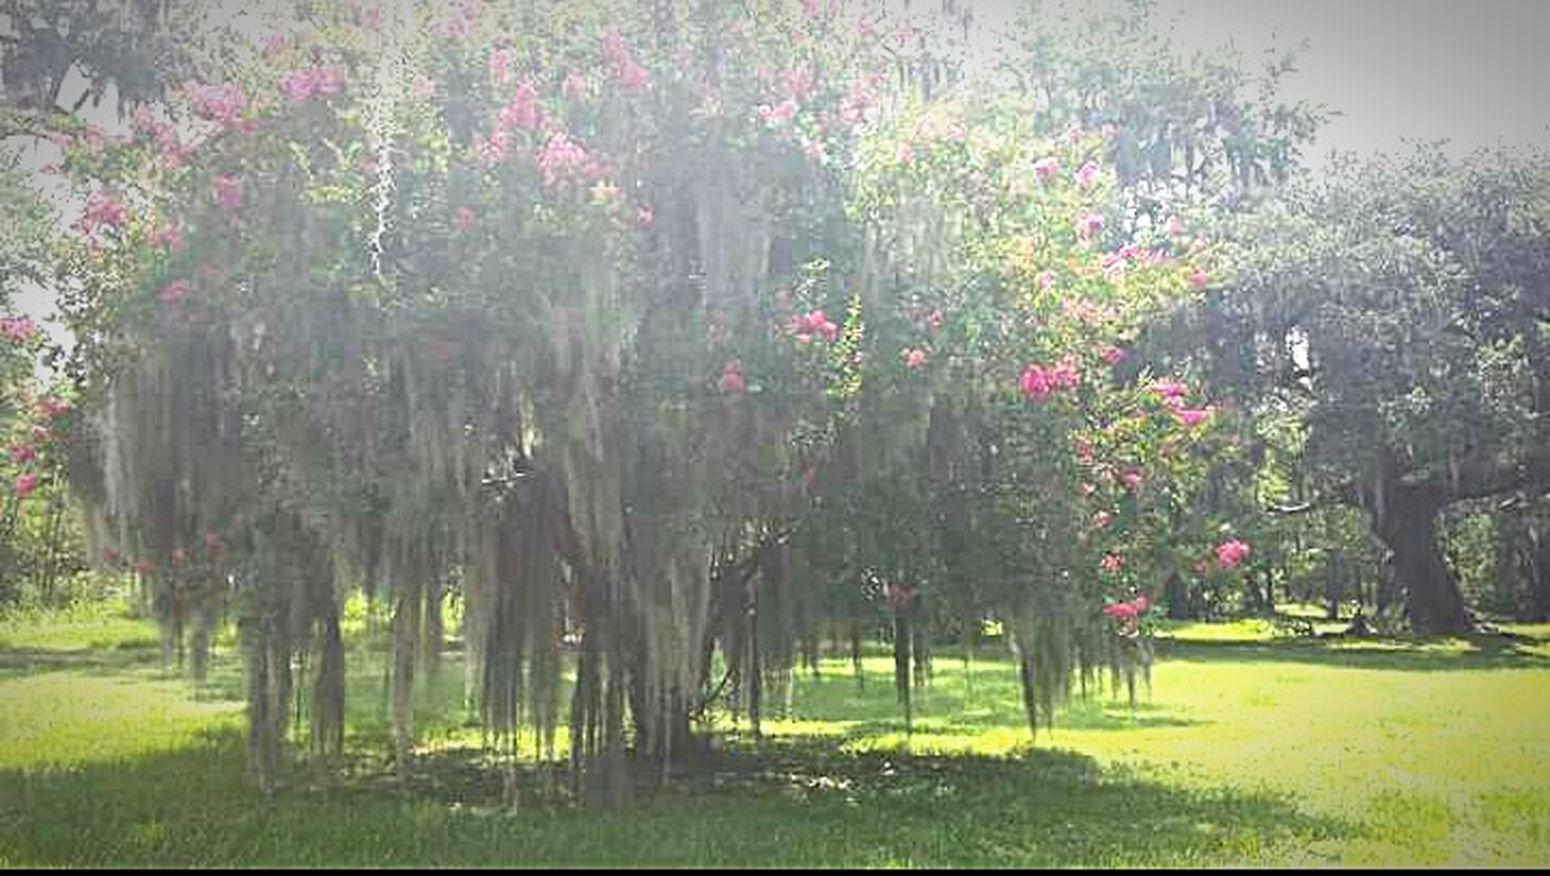 Glitch Exploring Beautiful Nature Treescape